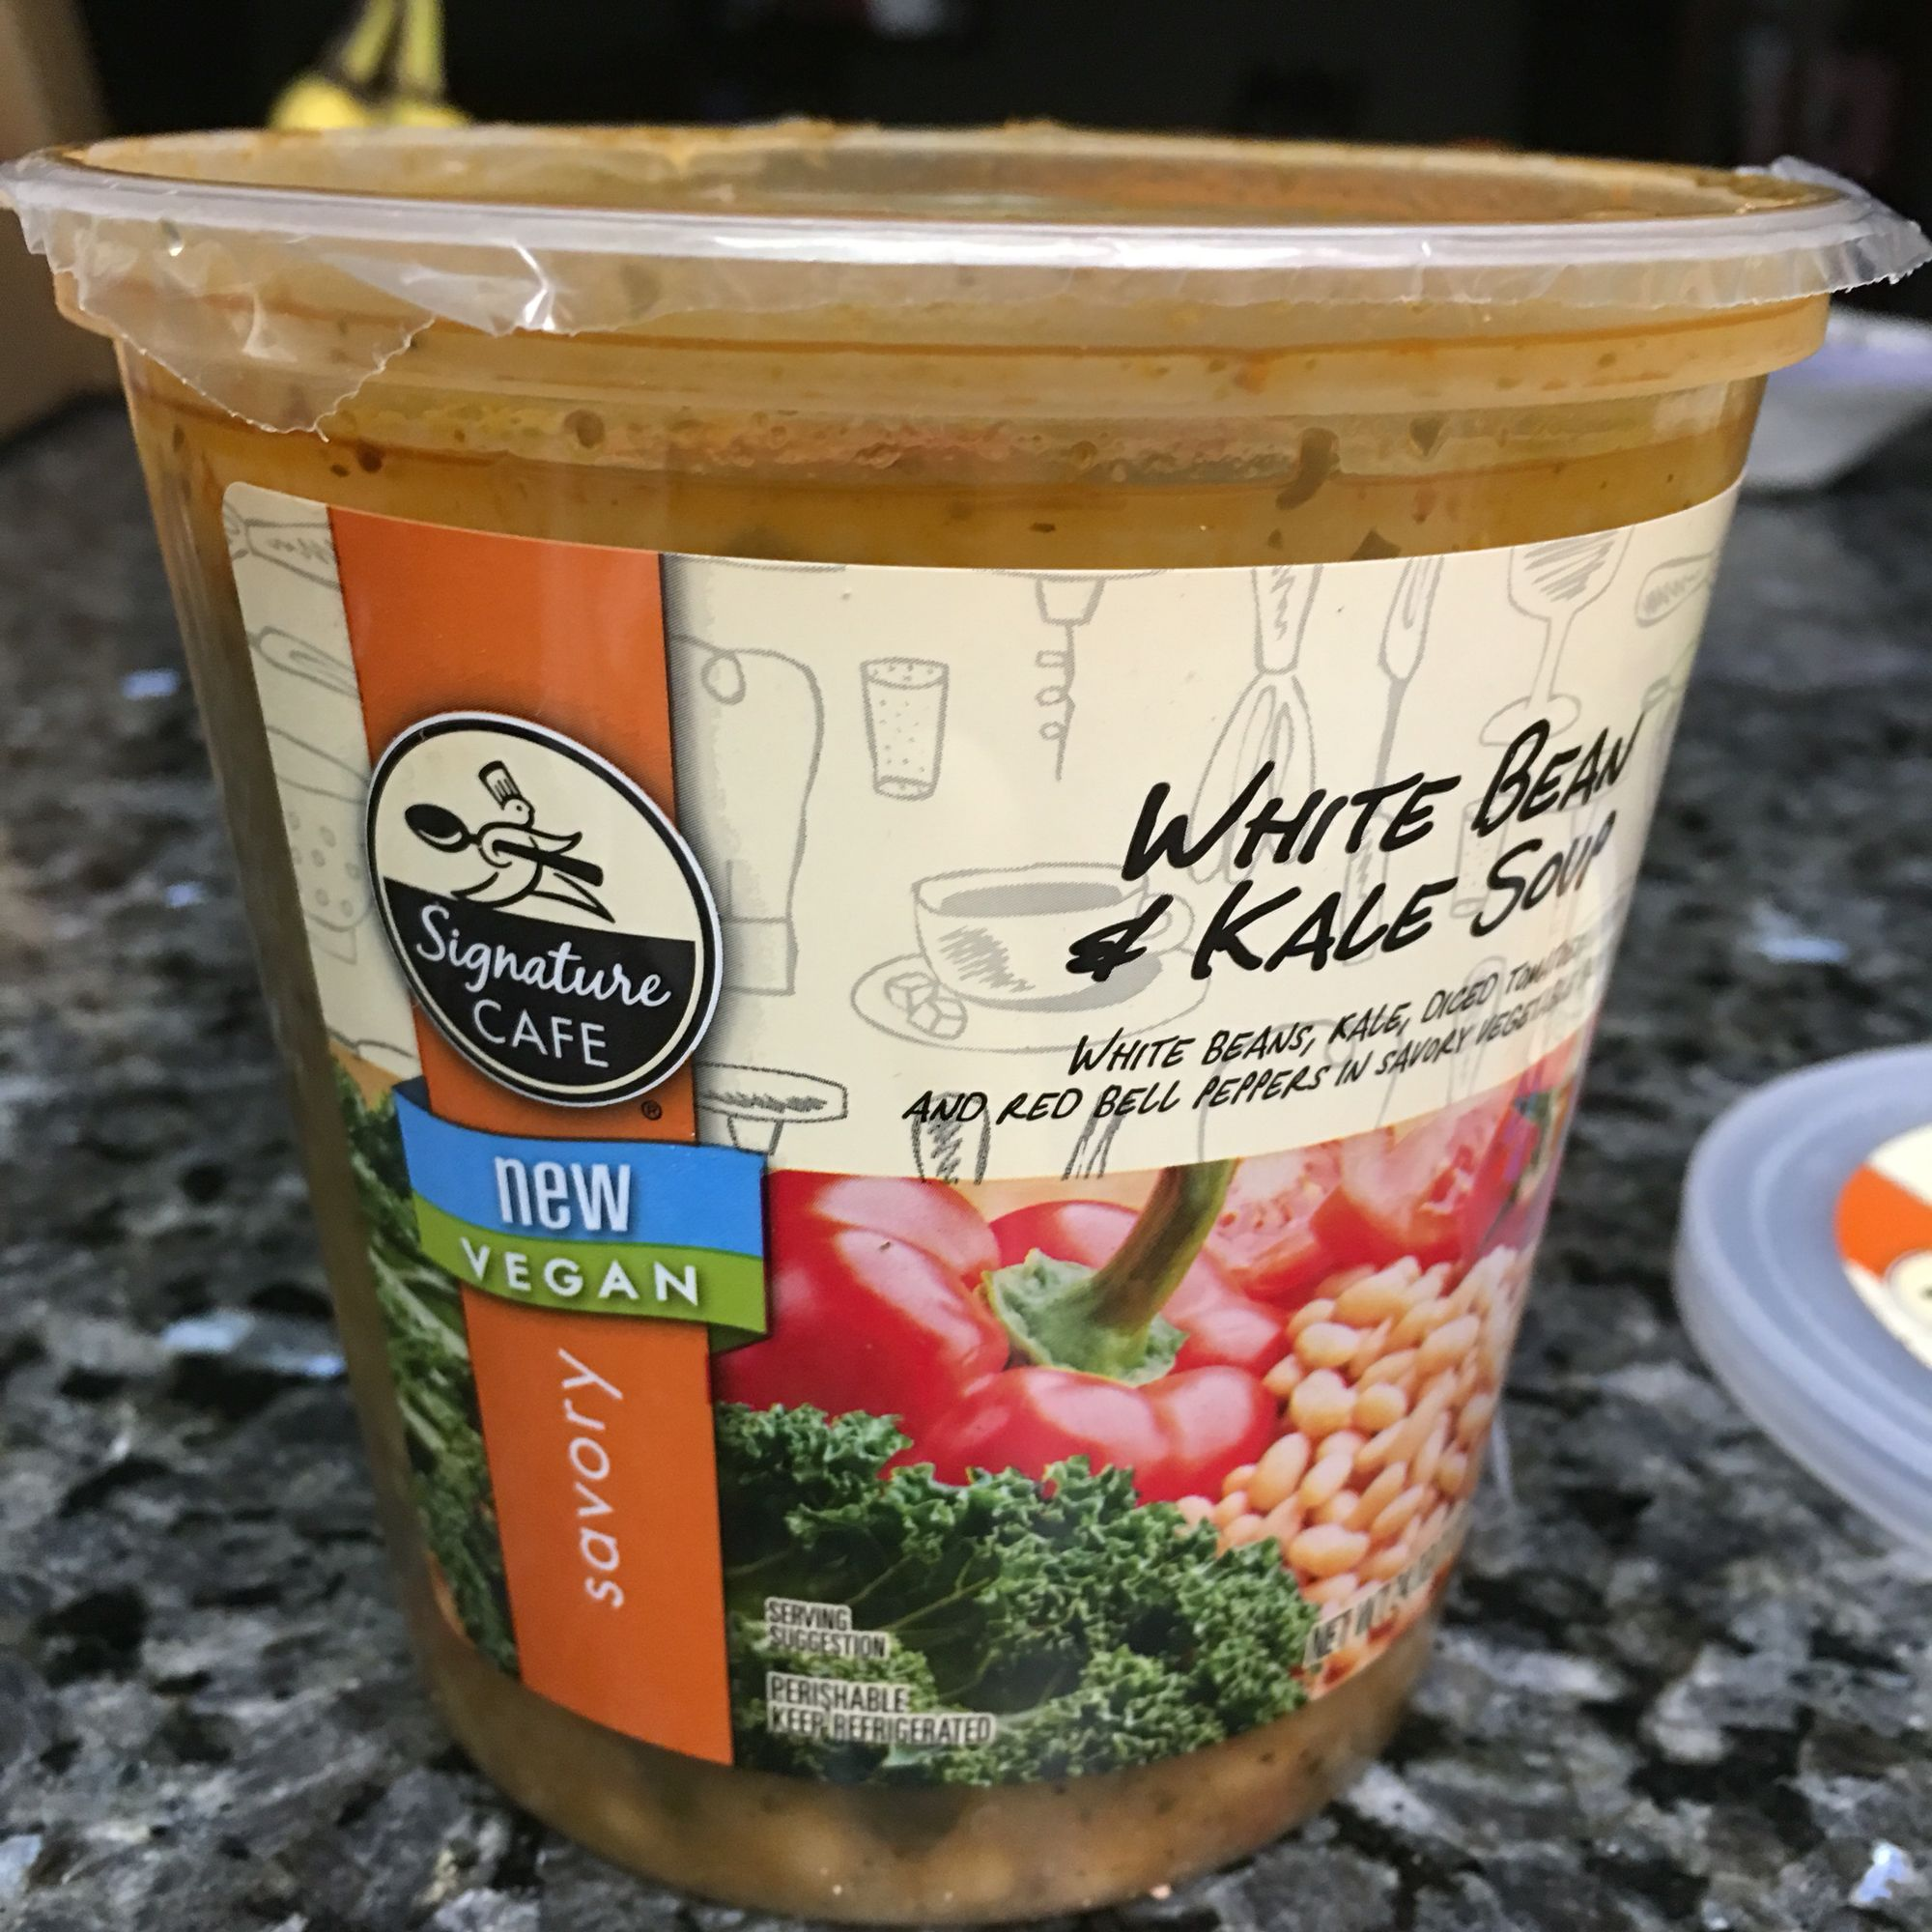 Available at Vons/Safeway #vegan #soup prepared | Vegan Fast Food ...